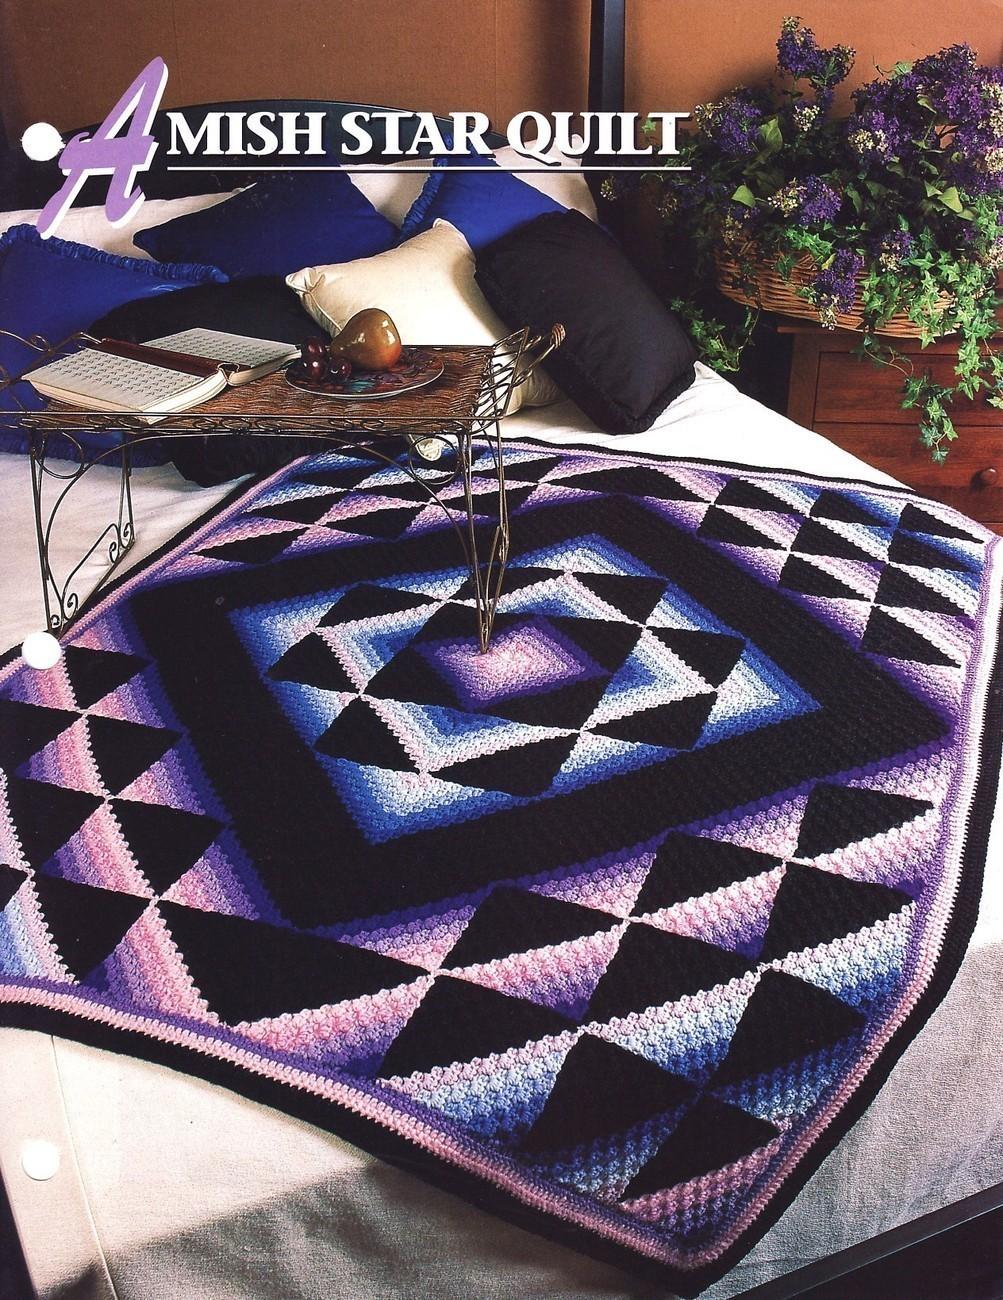 Rhinoceros Amigurumi Pattern : Amish Star Quilt Crochet Pattern Annies Crochet Quilt ...